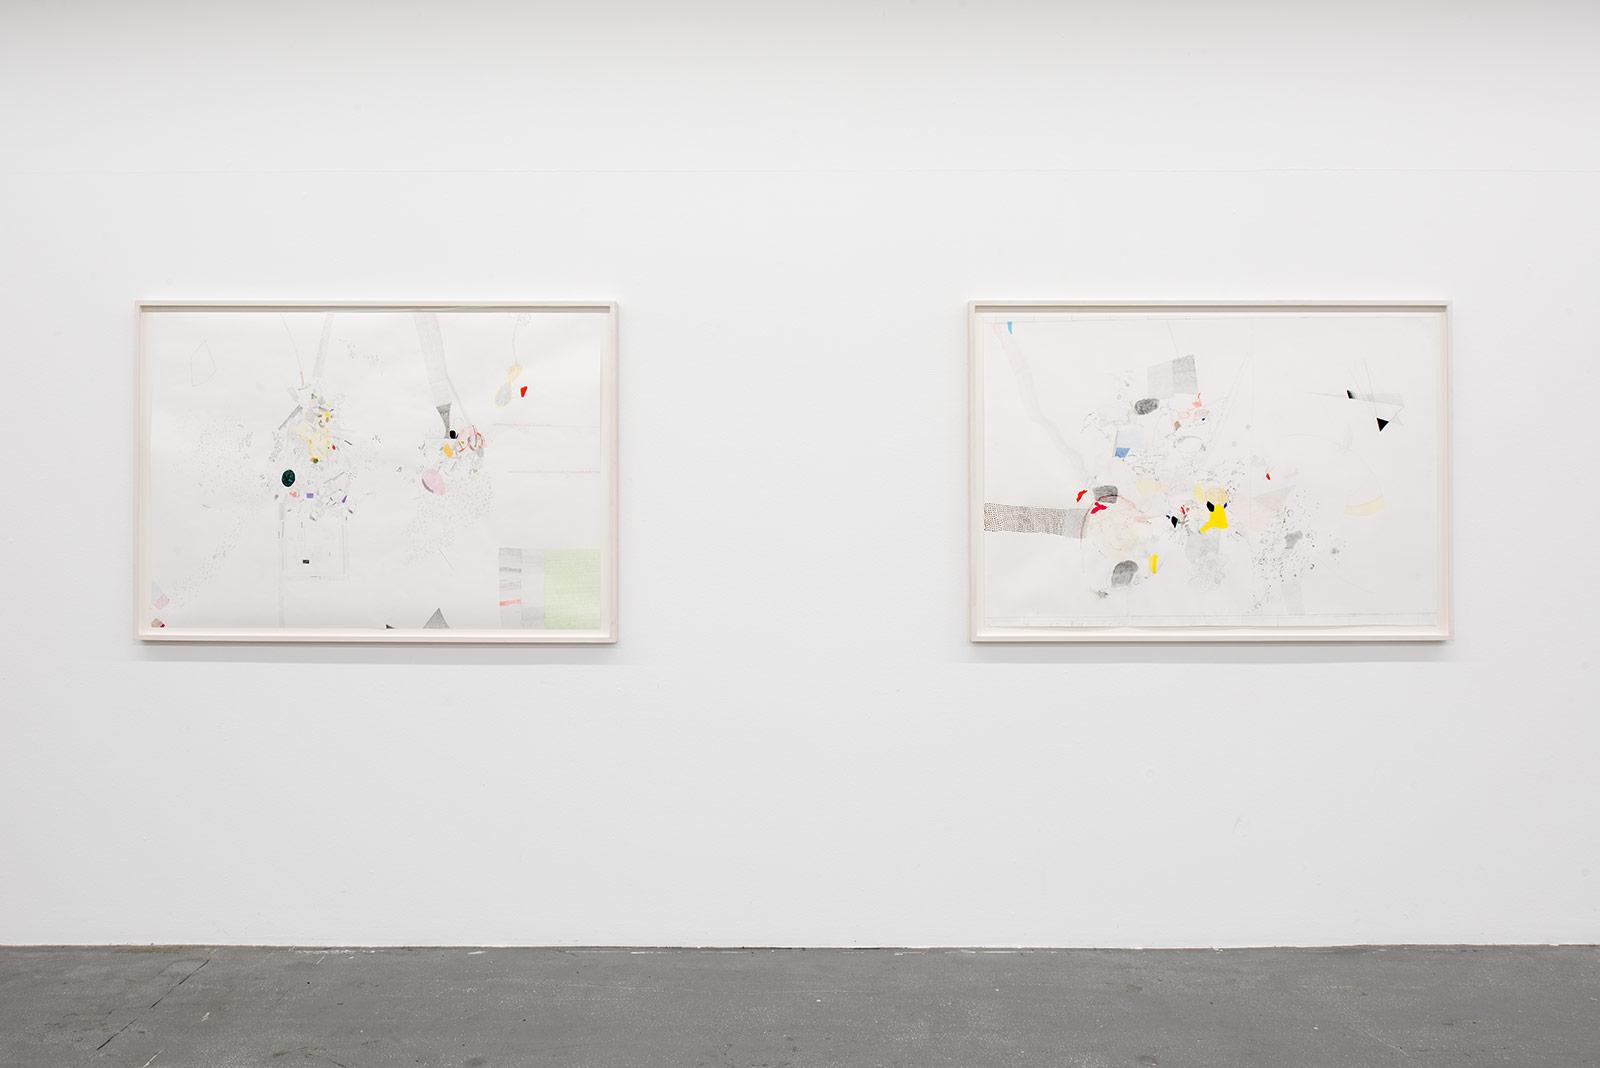 Tanja Weidmann – Institut Kunst, Diplom 2017